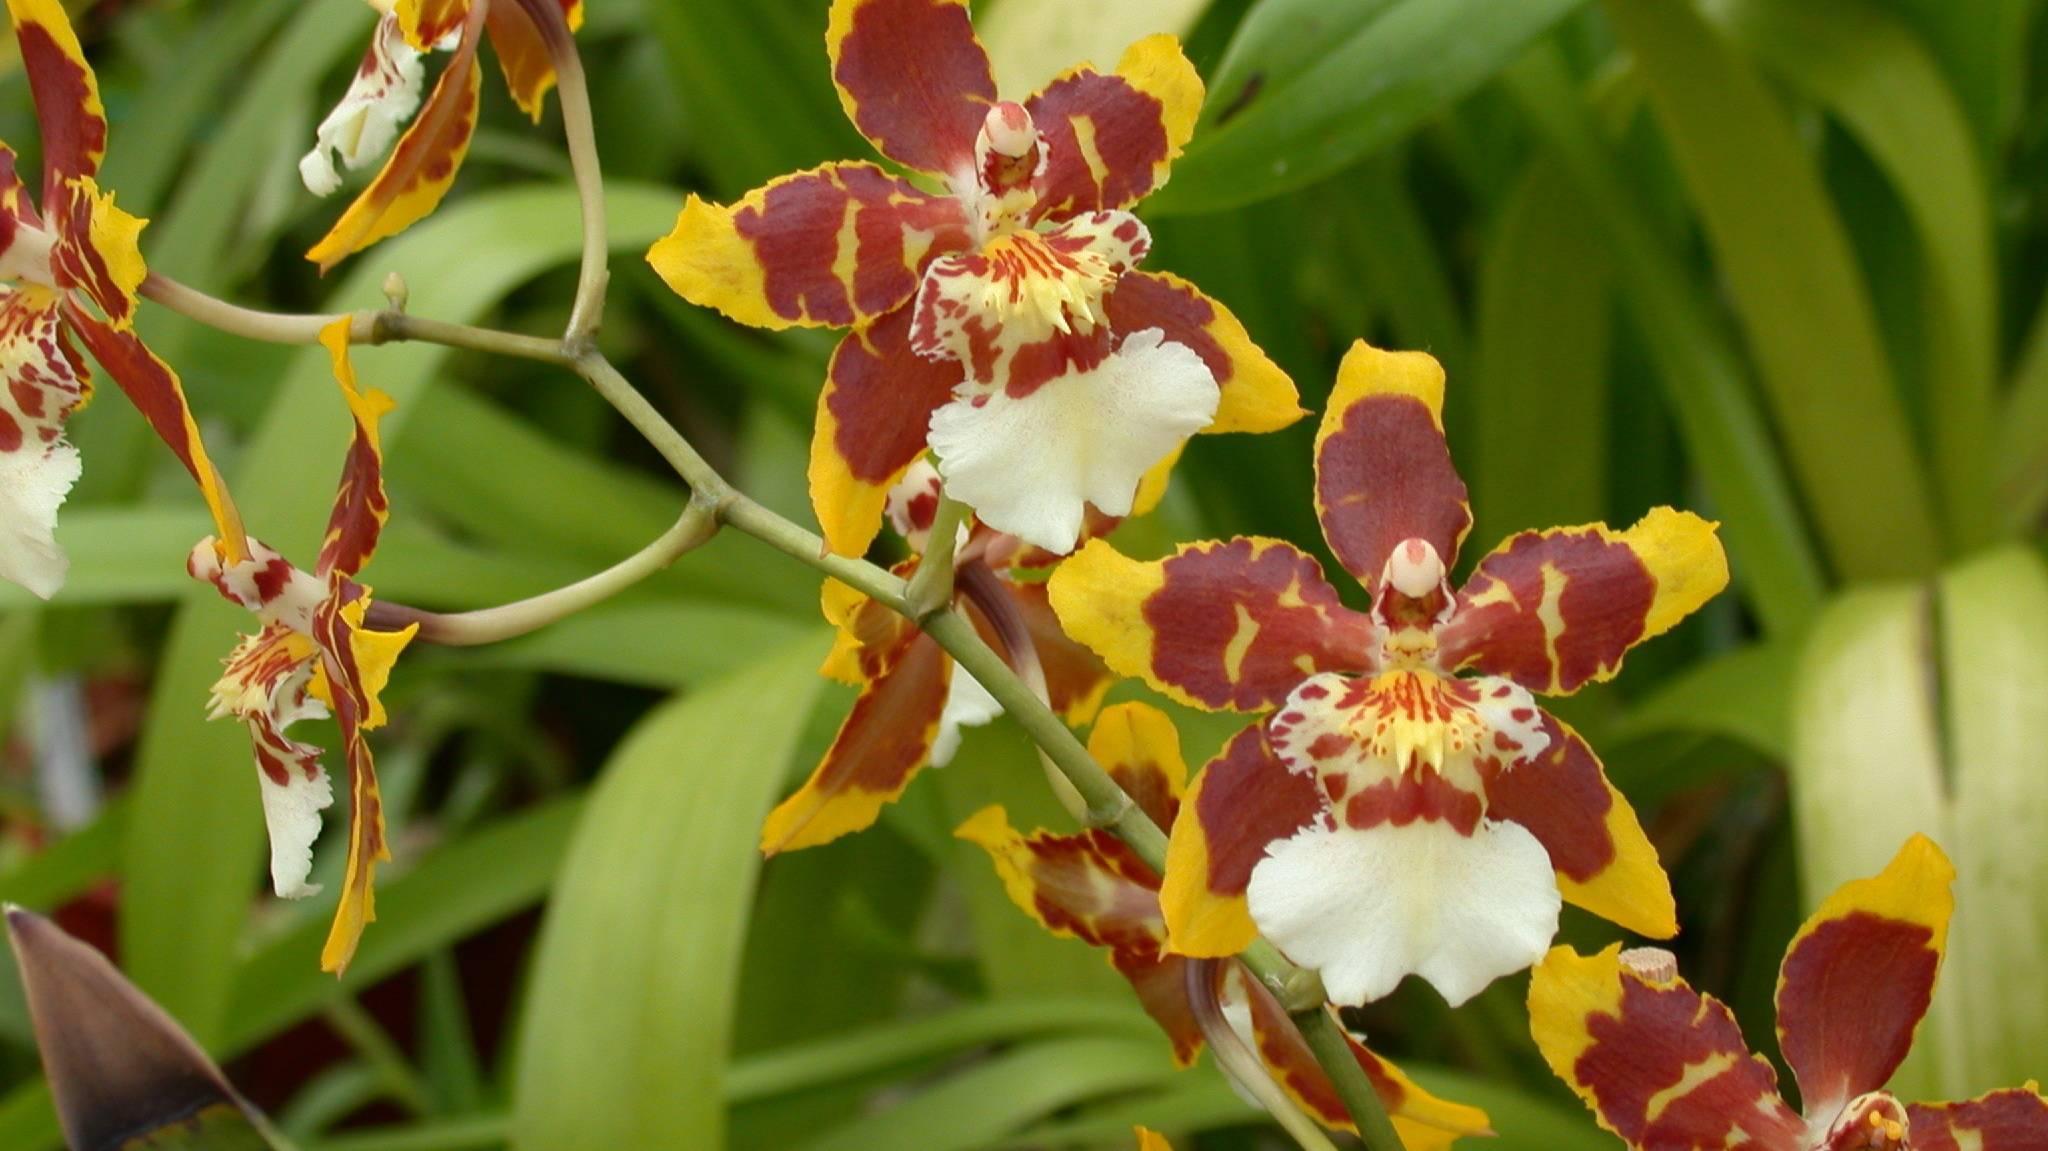 Орхидея камбрия – уход в домашних условиях. выращивание камбрии, пересадка и размножение. описание, виды. фото